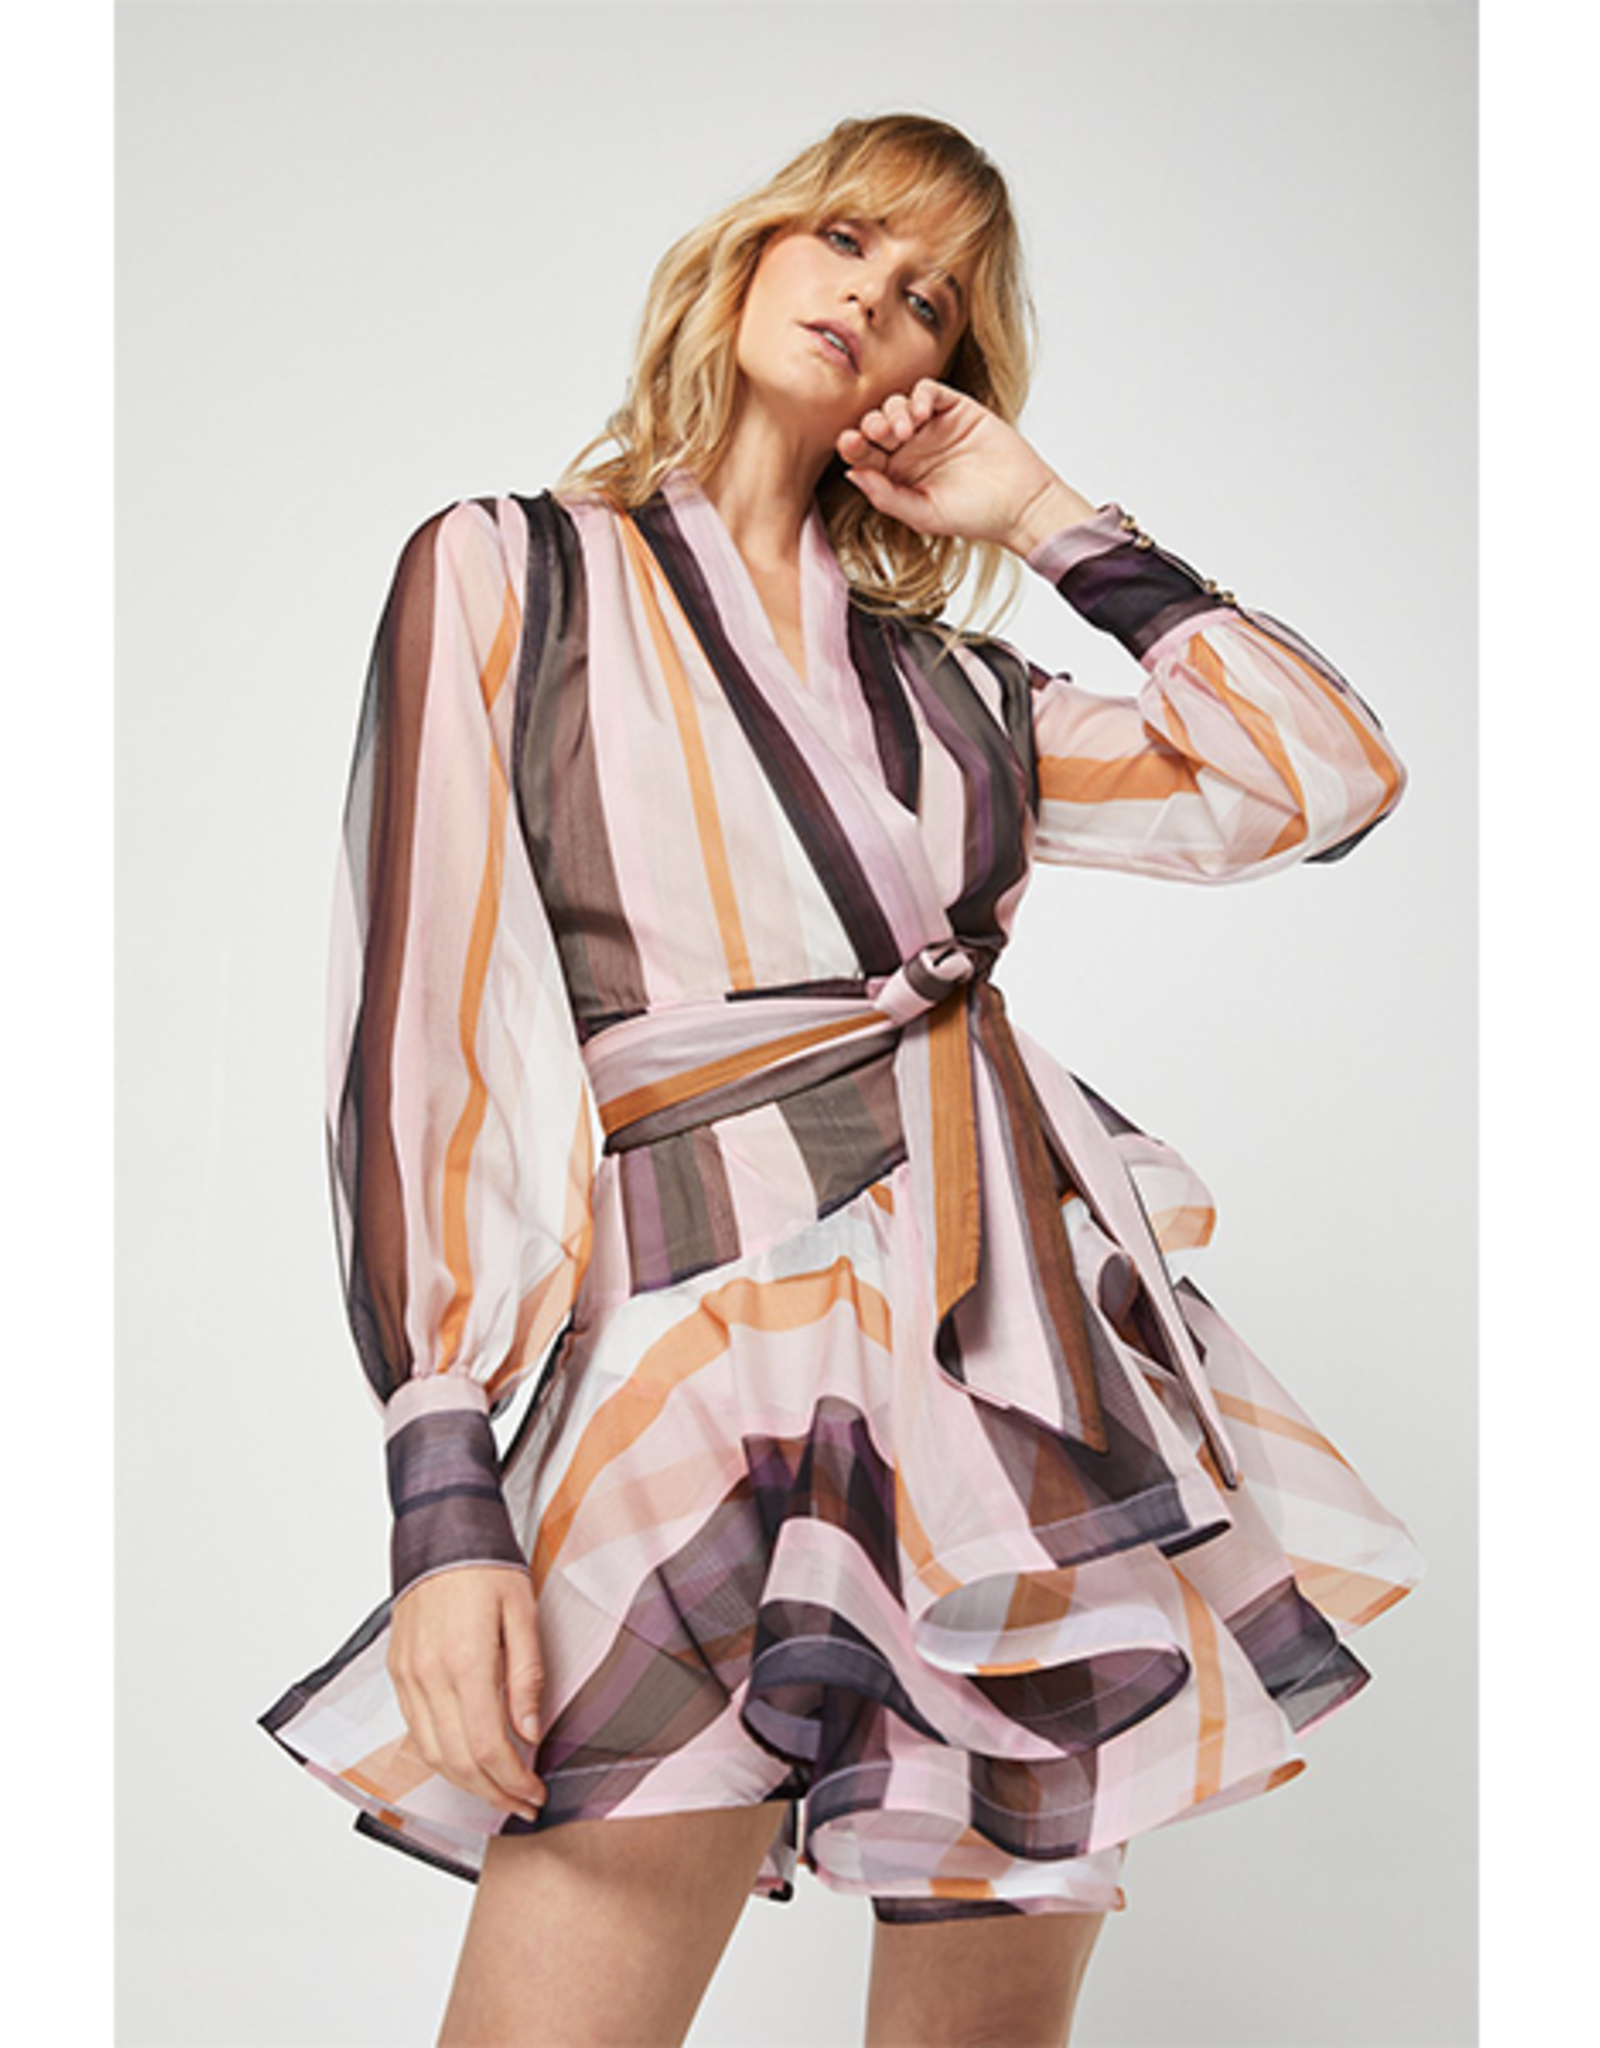 Elliatt Cynthia Dress in Stripe